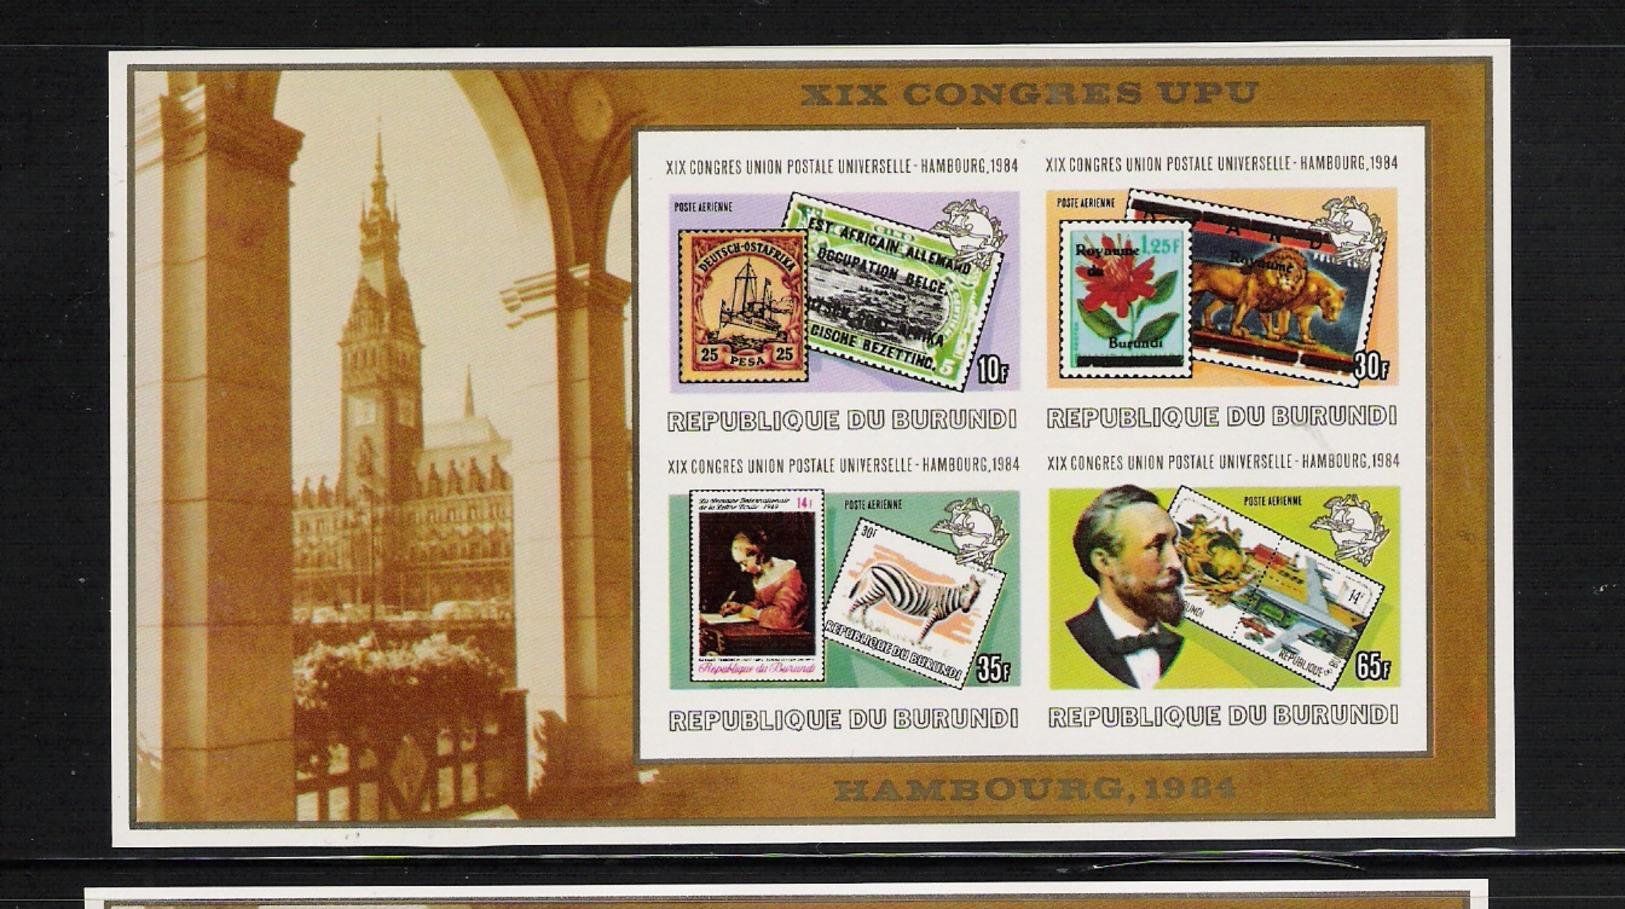 BURUNDI, 1984, 19th UPU Congress, Hamburg S/s Imperf. MNH - U.P.U.